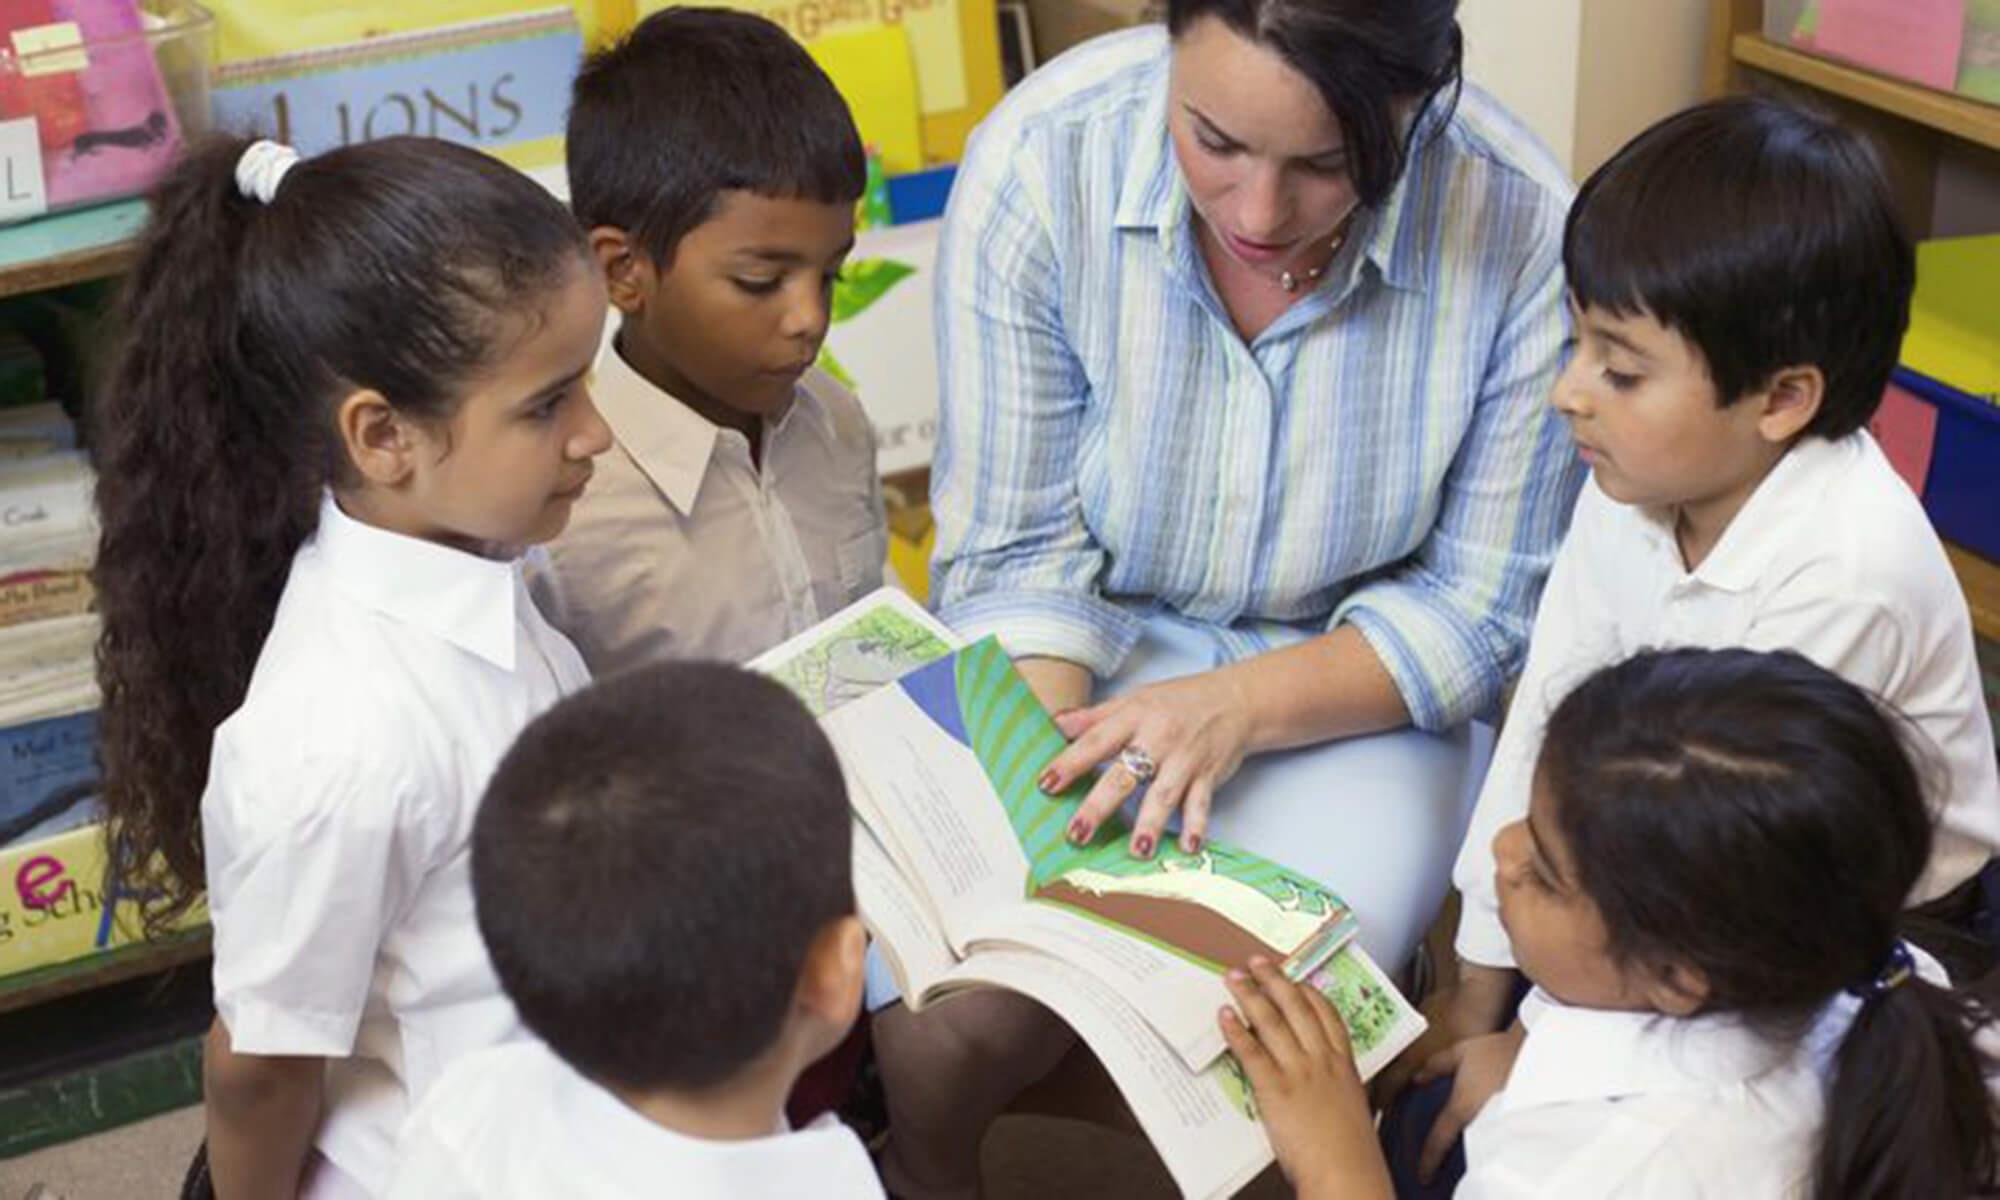 Multicultural classroom